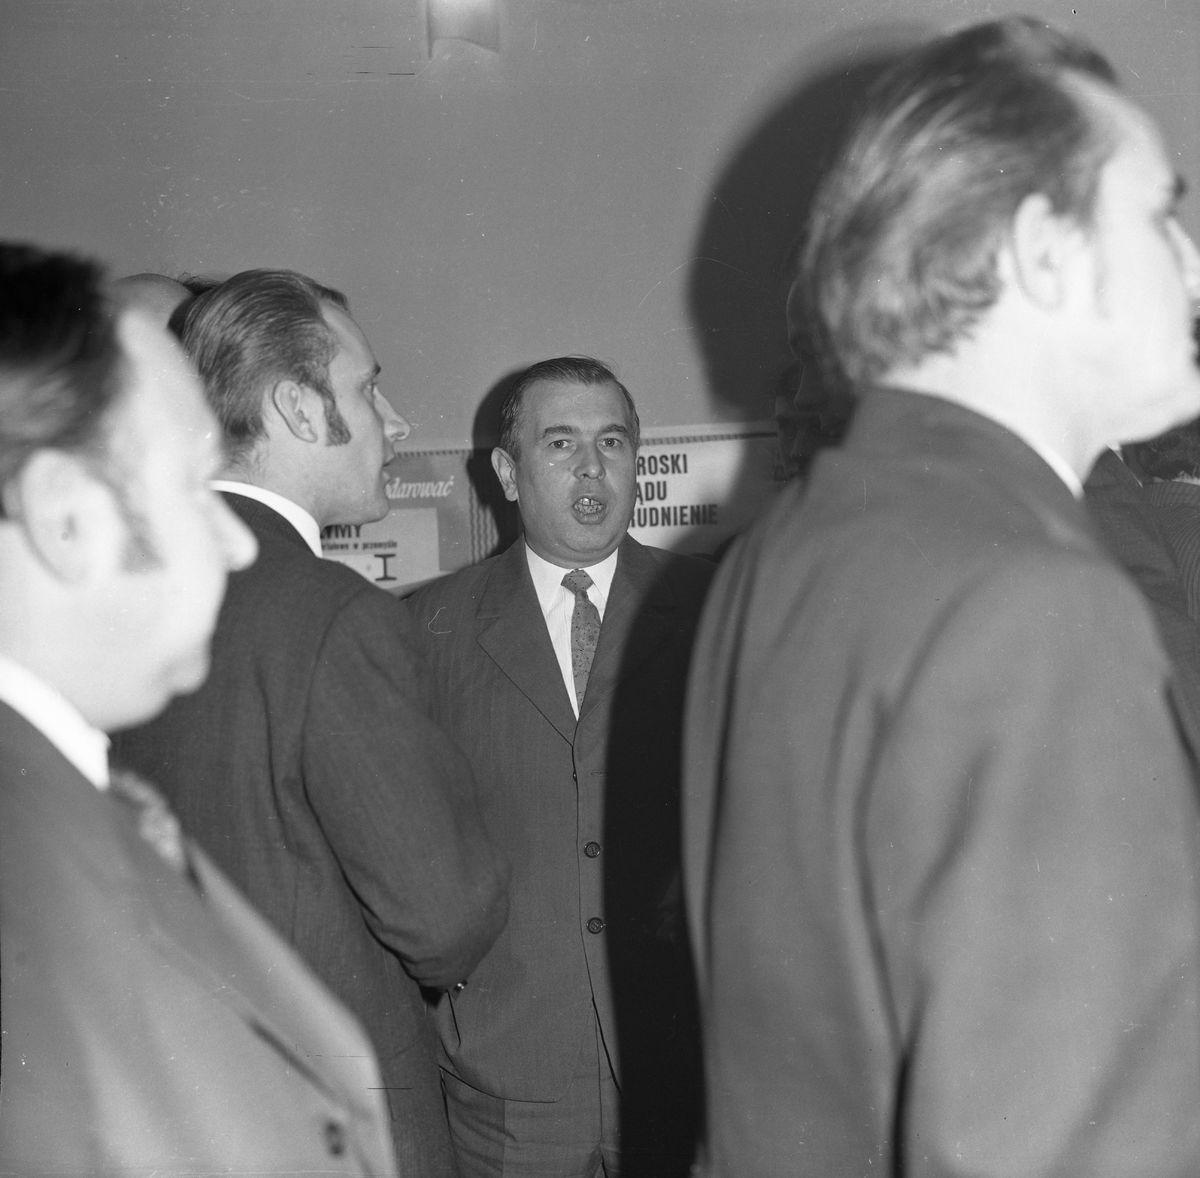 Spotkanie partyjne, 1974 r. [2]